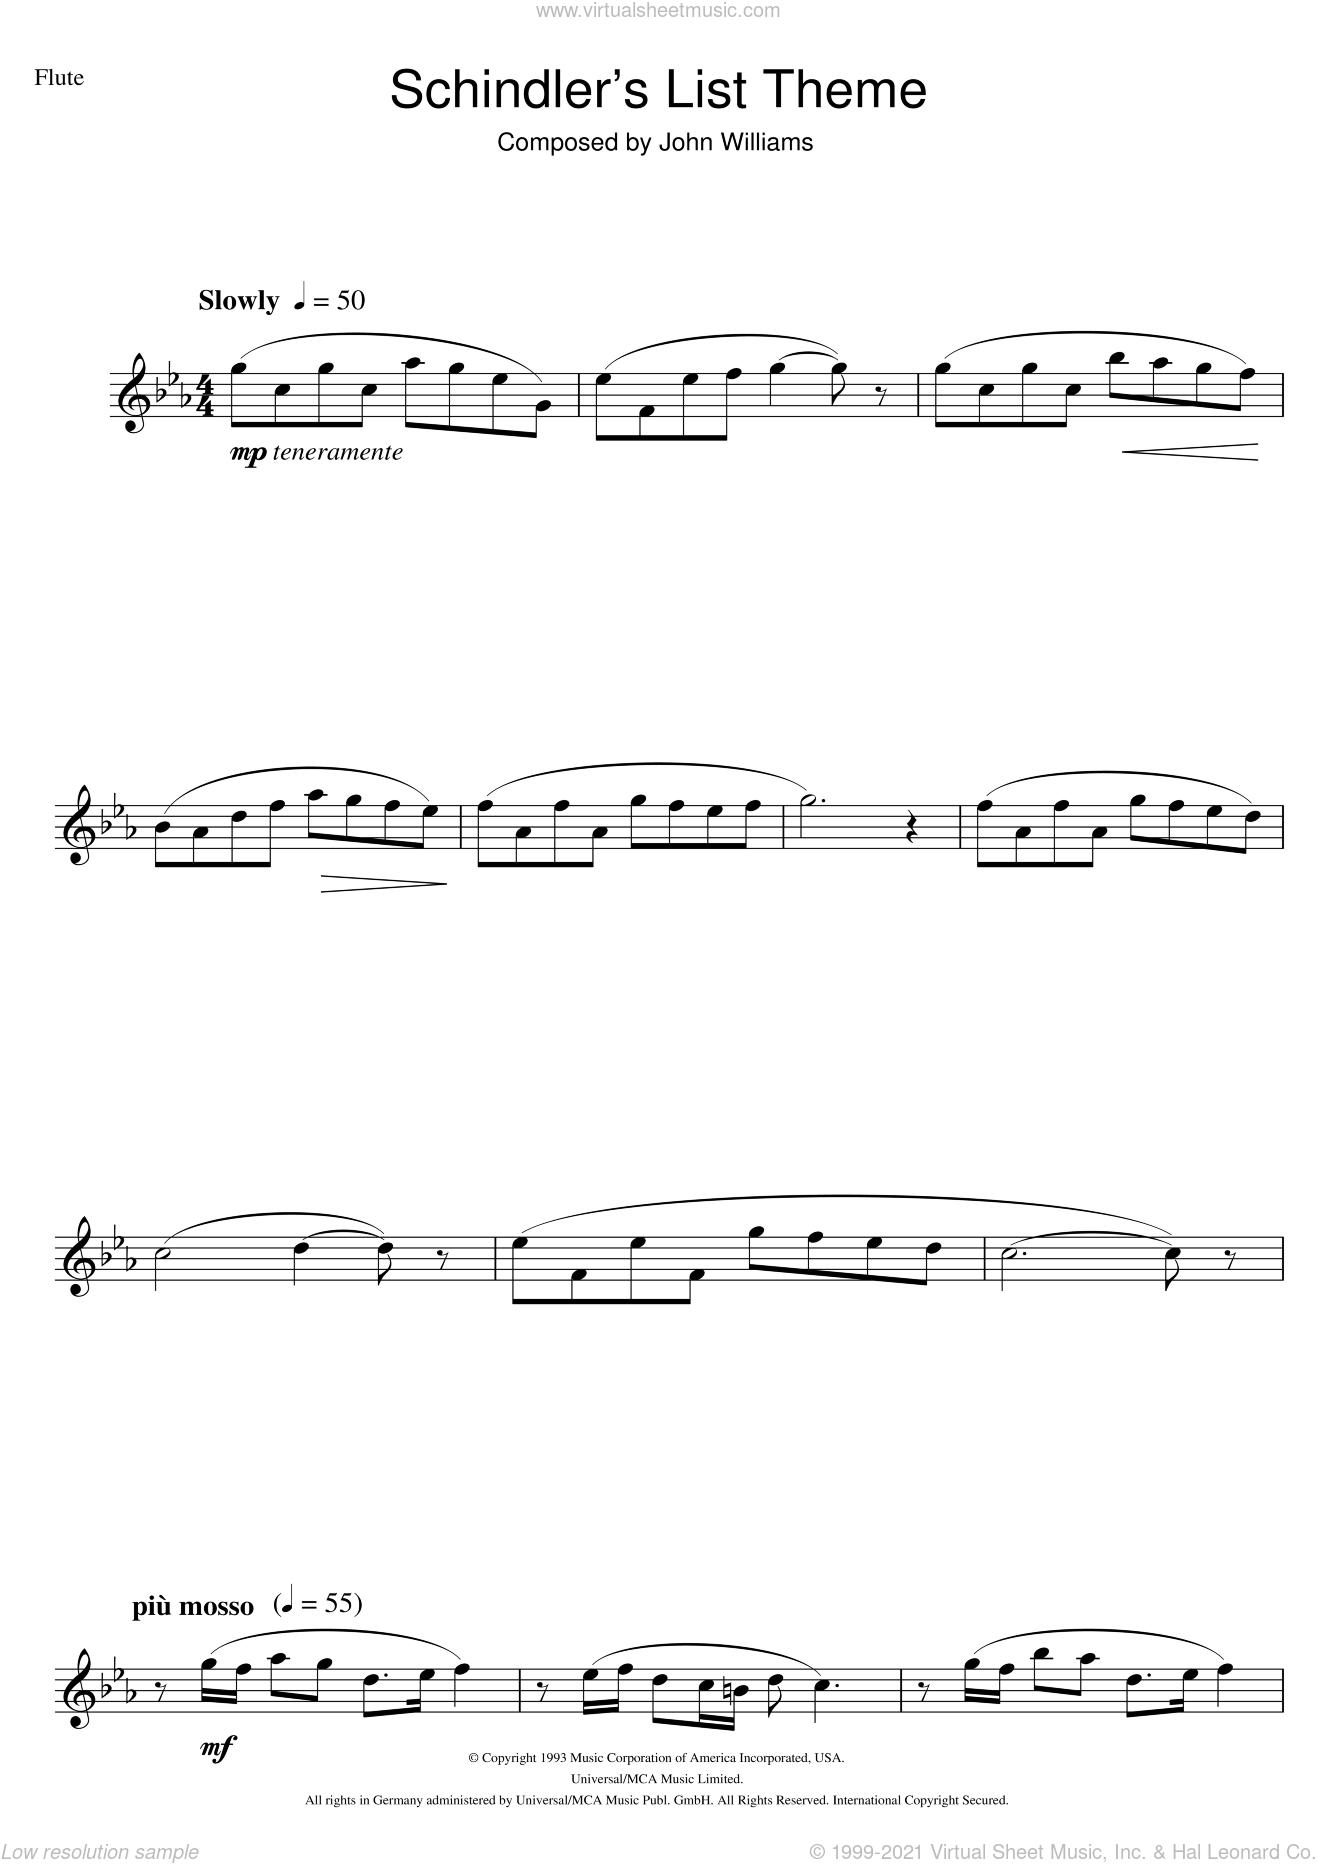 Schindler's List sheet music for flute solo by John Williams, intermediate skill level